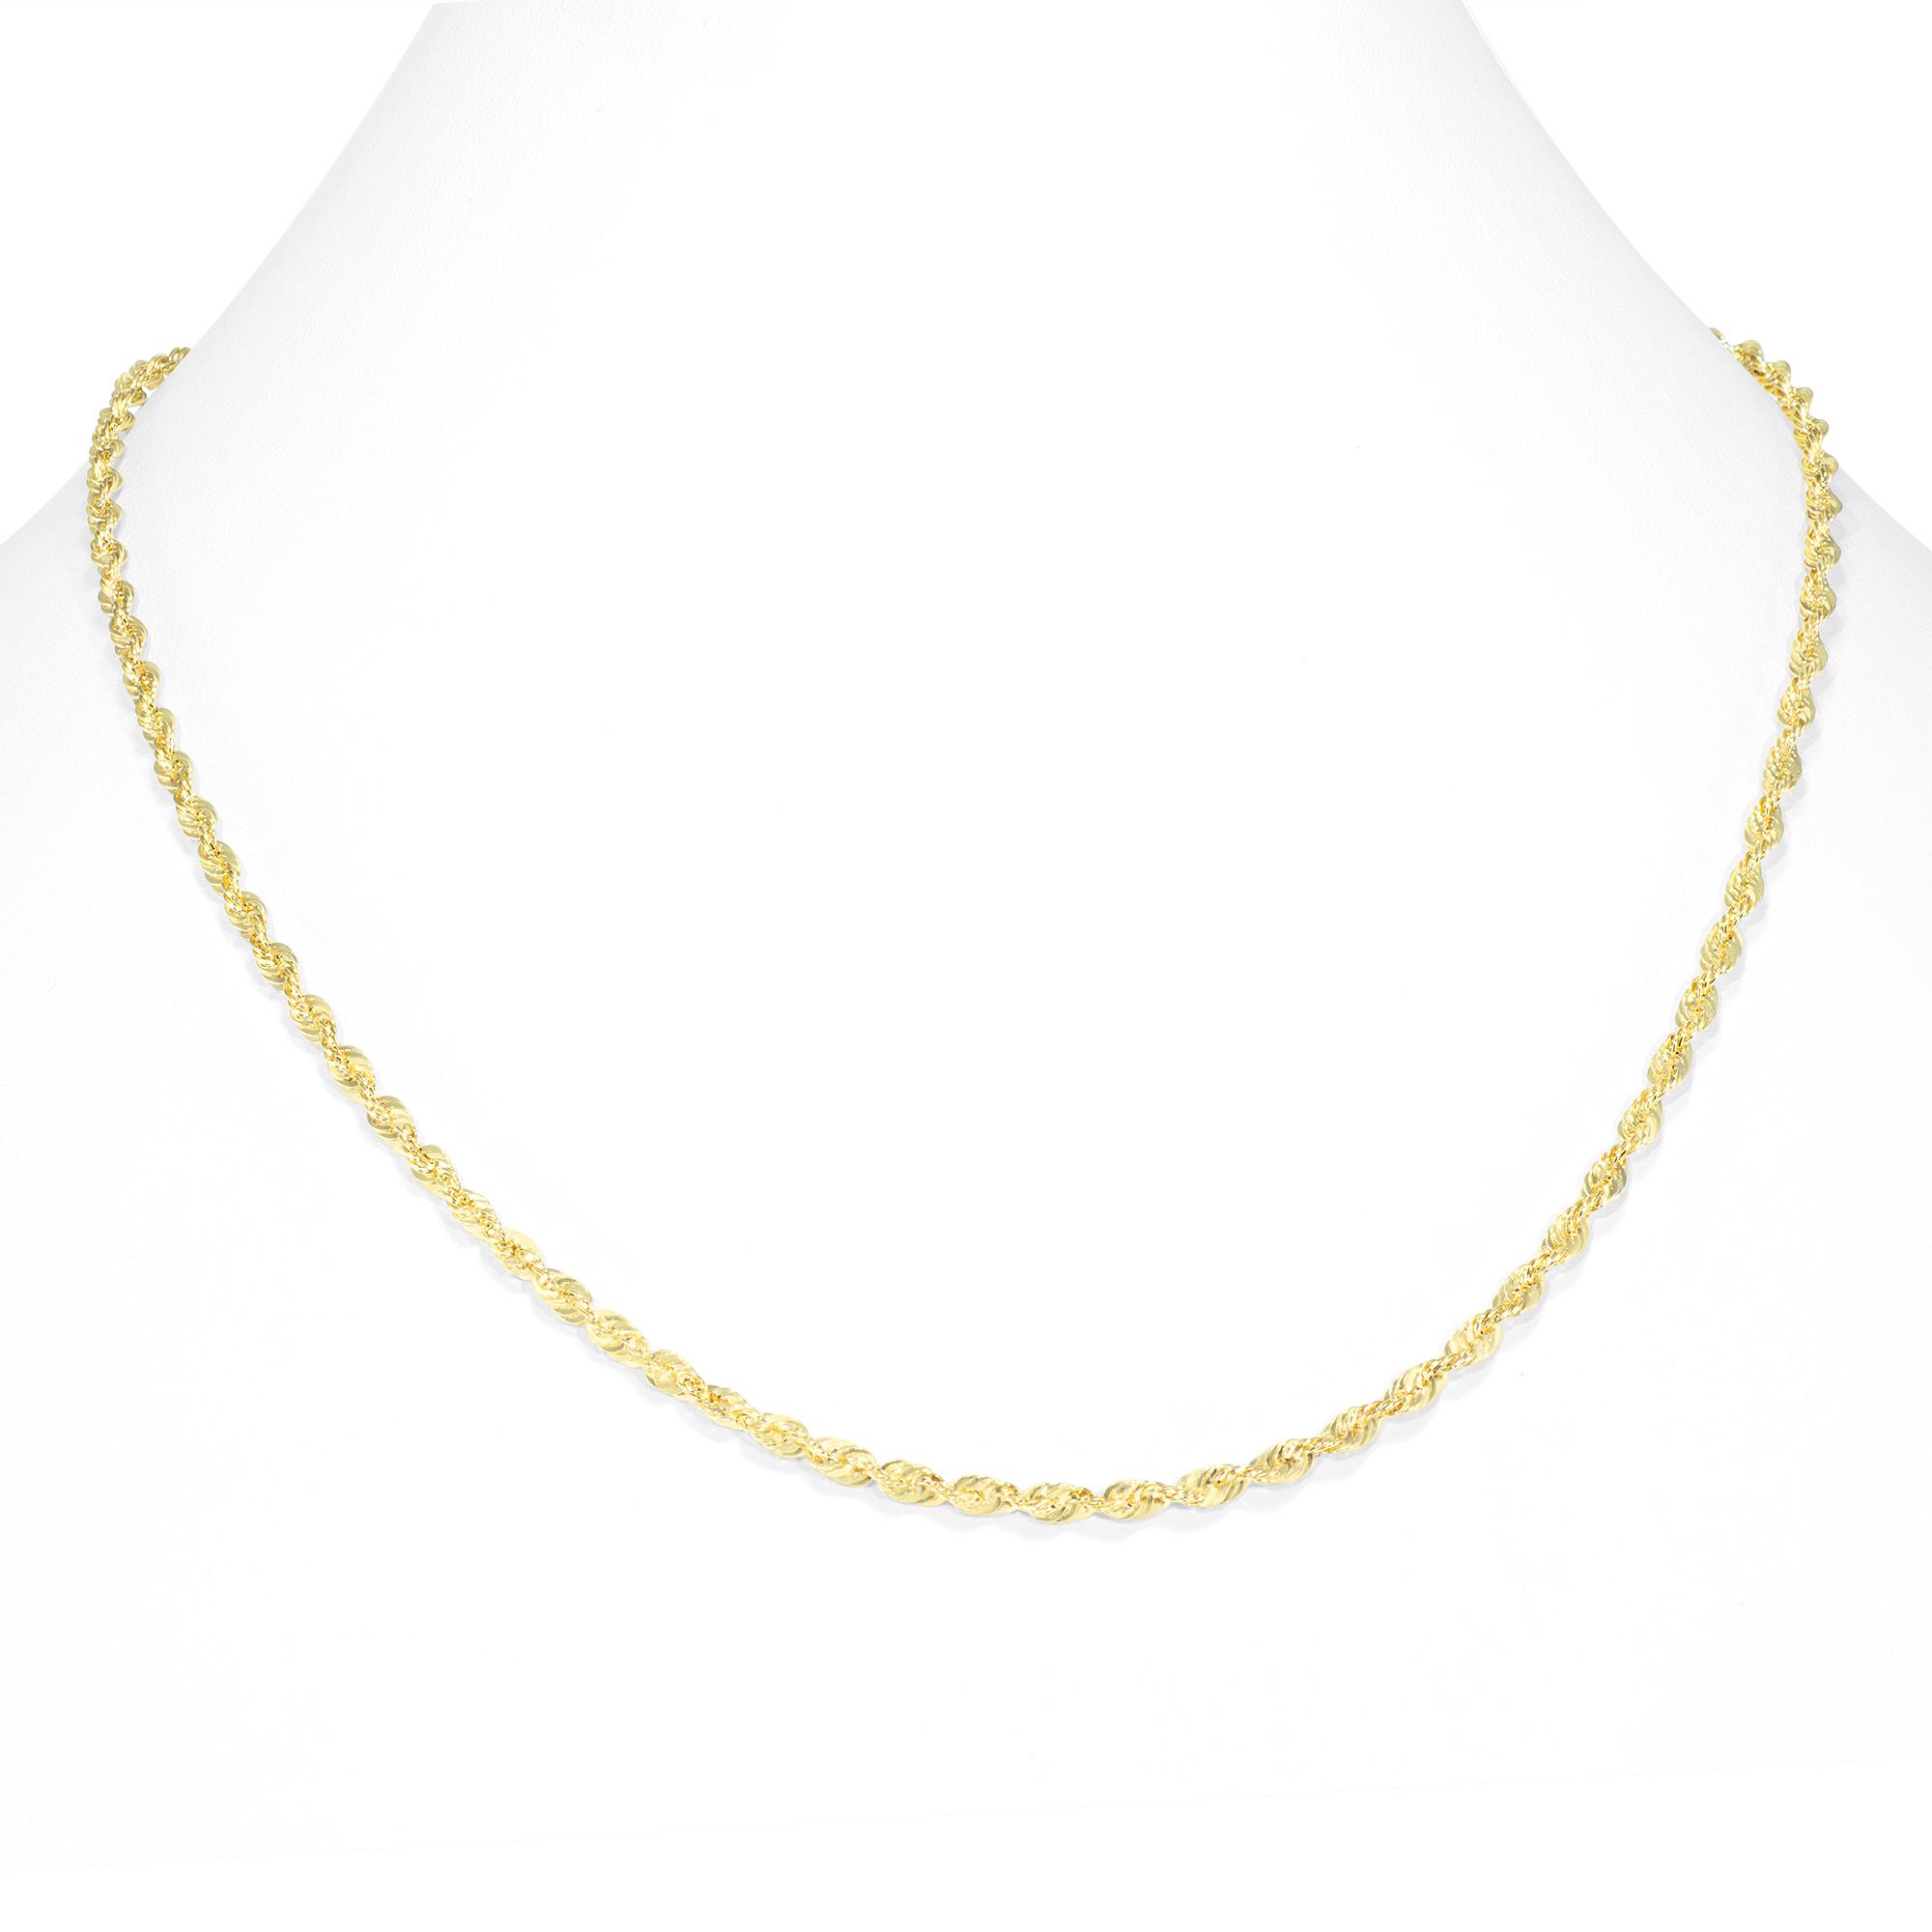 "10K Yellow Gold Light 1.5mm-4mm Diamond Cut Rope Chain Pendant Necklace 14""- 30"" 12"